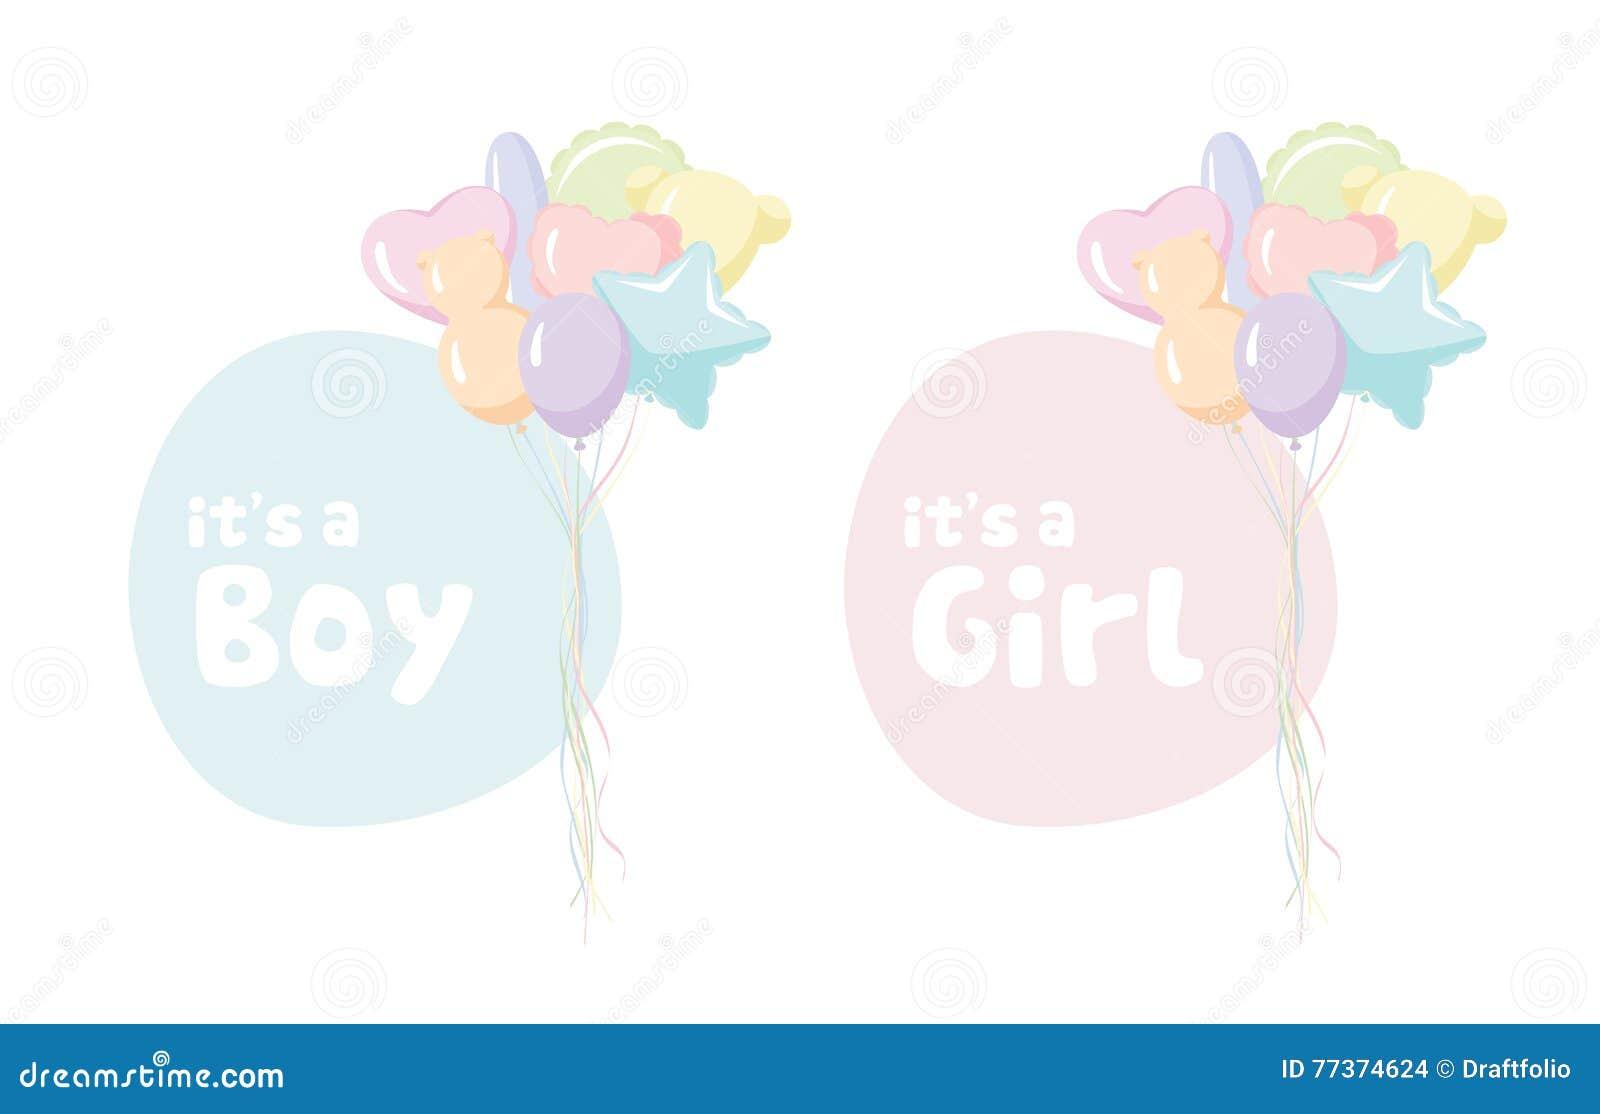 Babyparty Einladung Vektor Abbildung